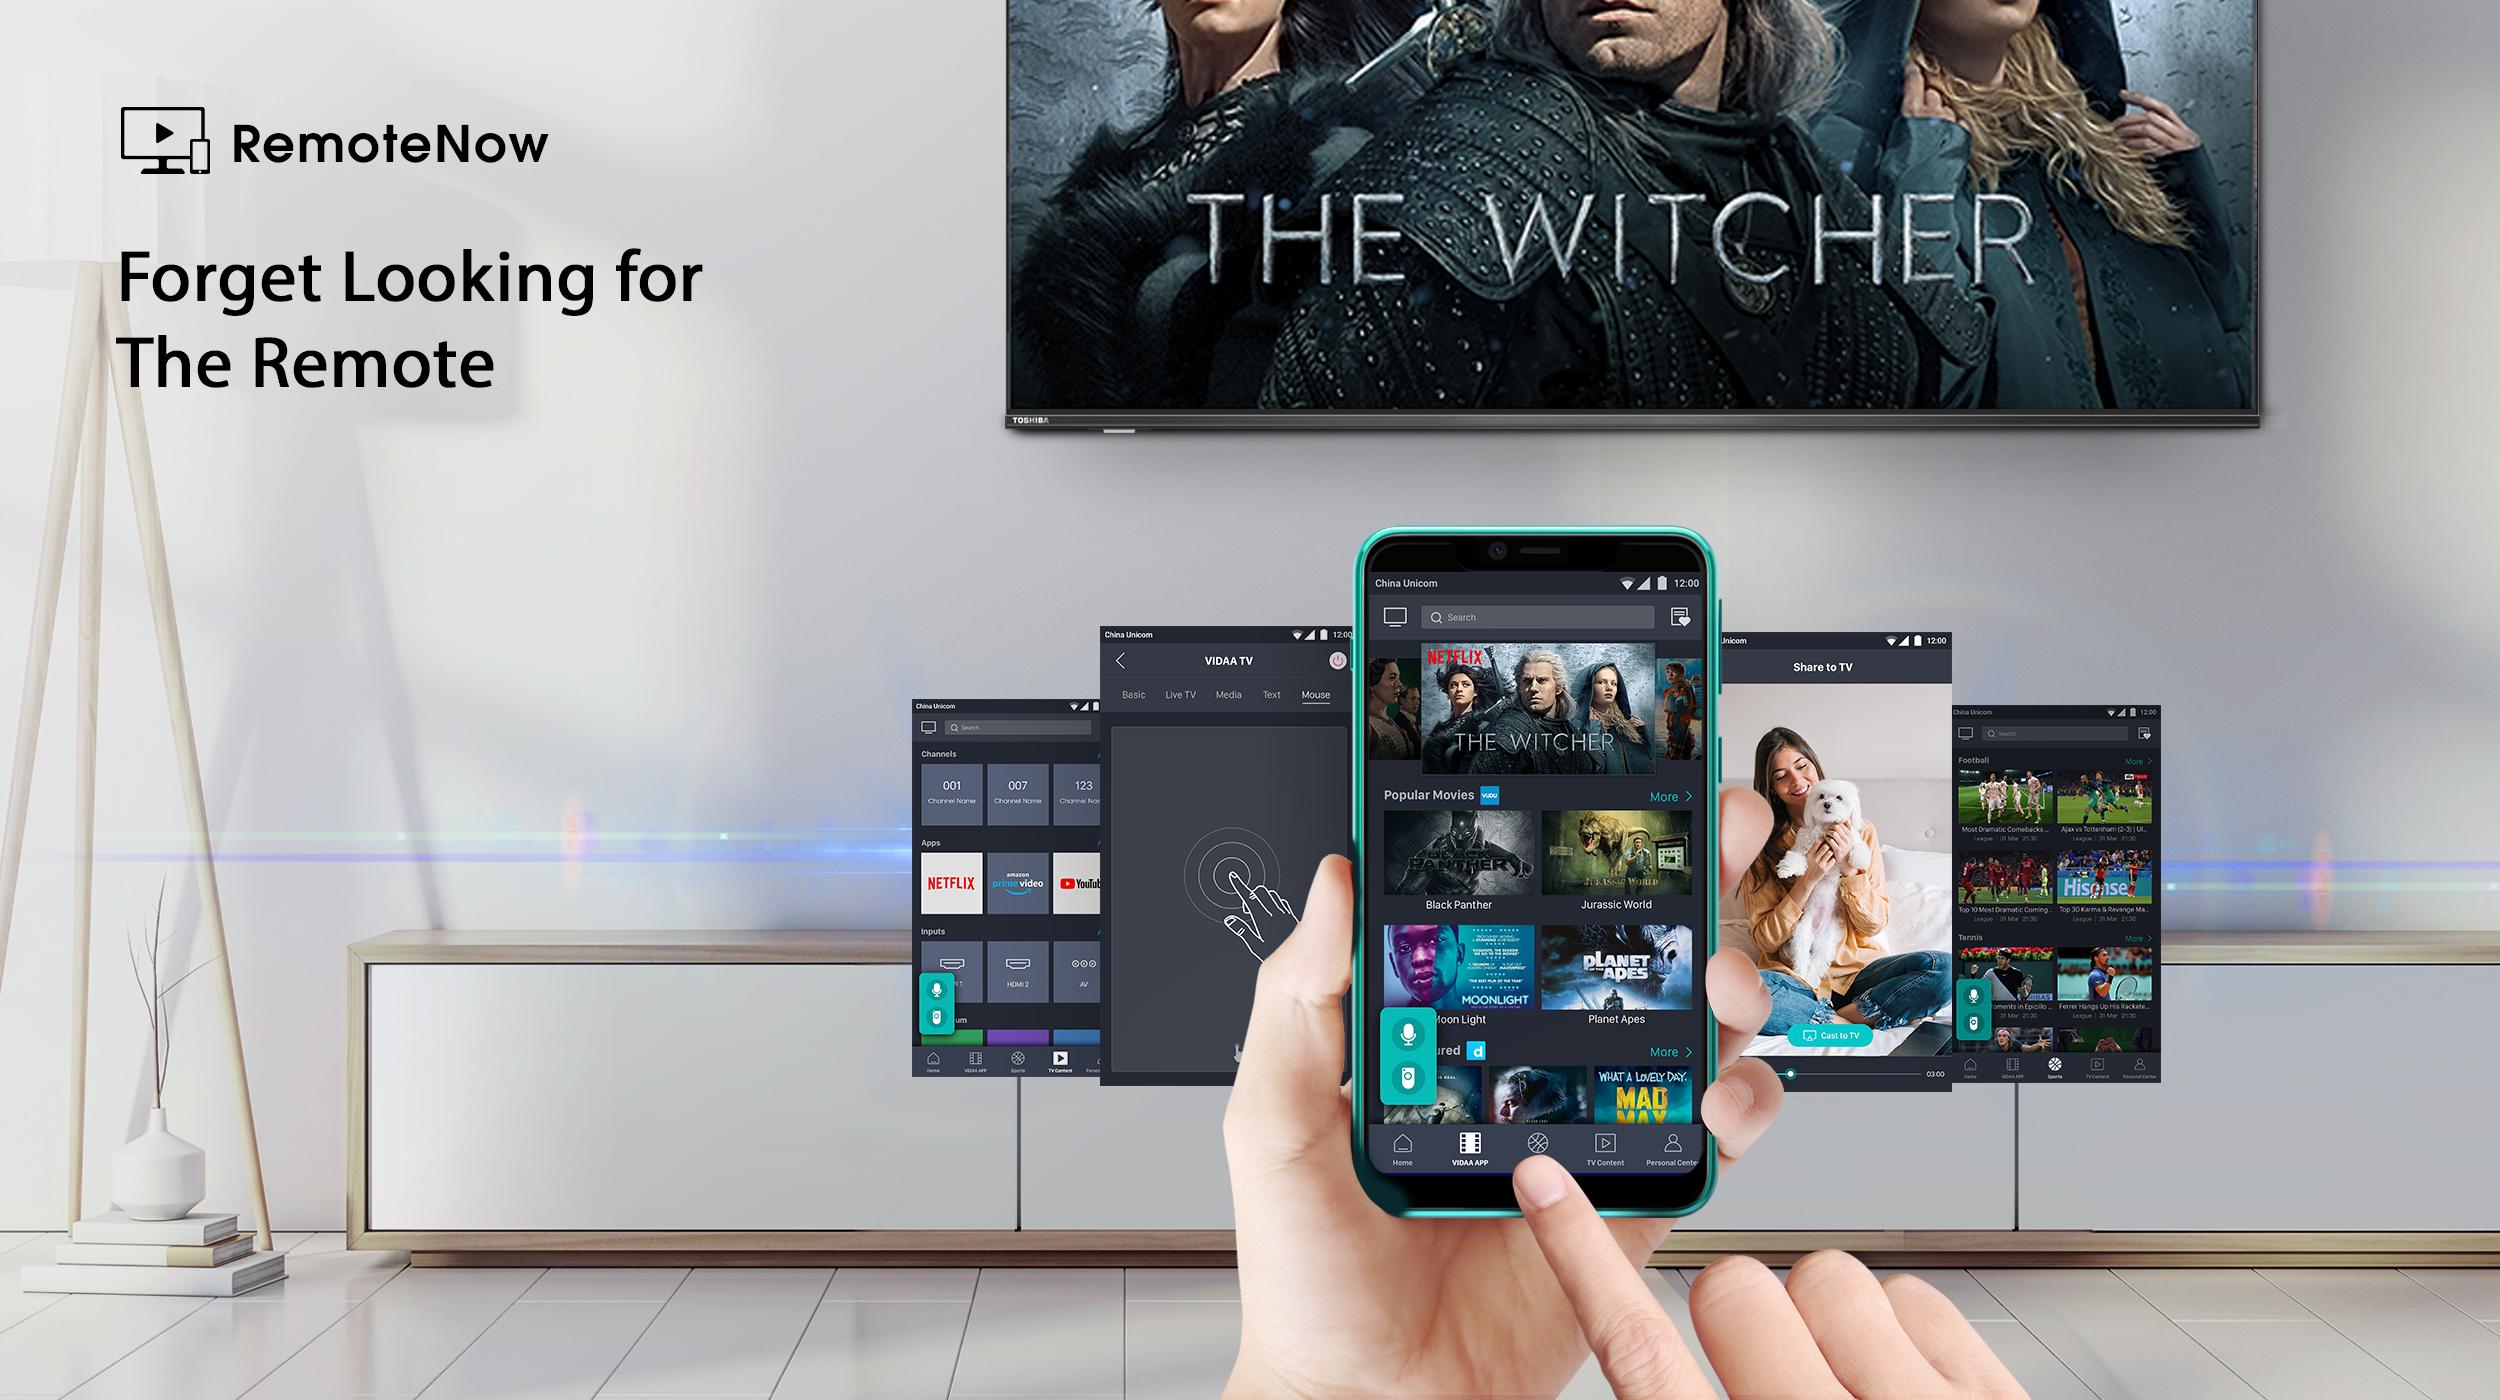 Toshiba 4K Smarter TV with RemoteNow Android & iOS App